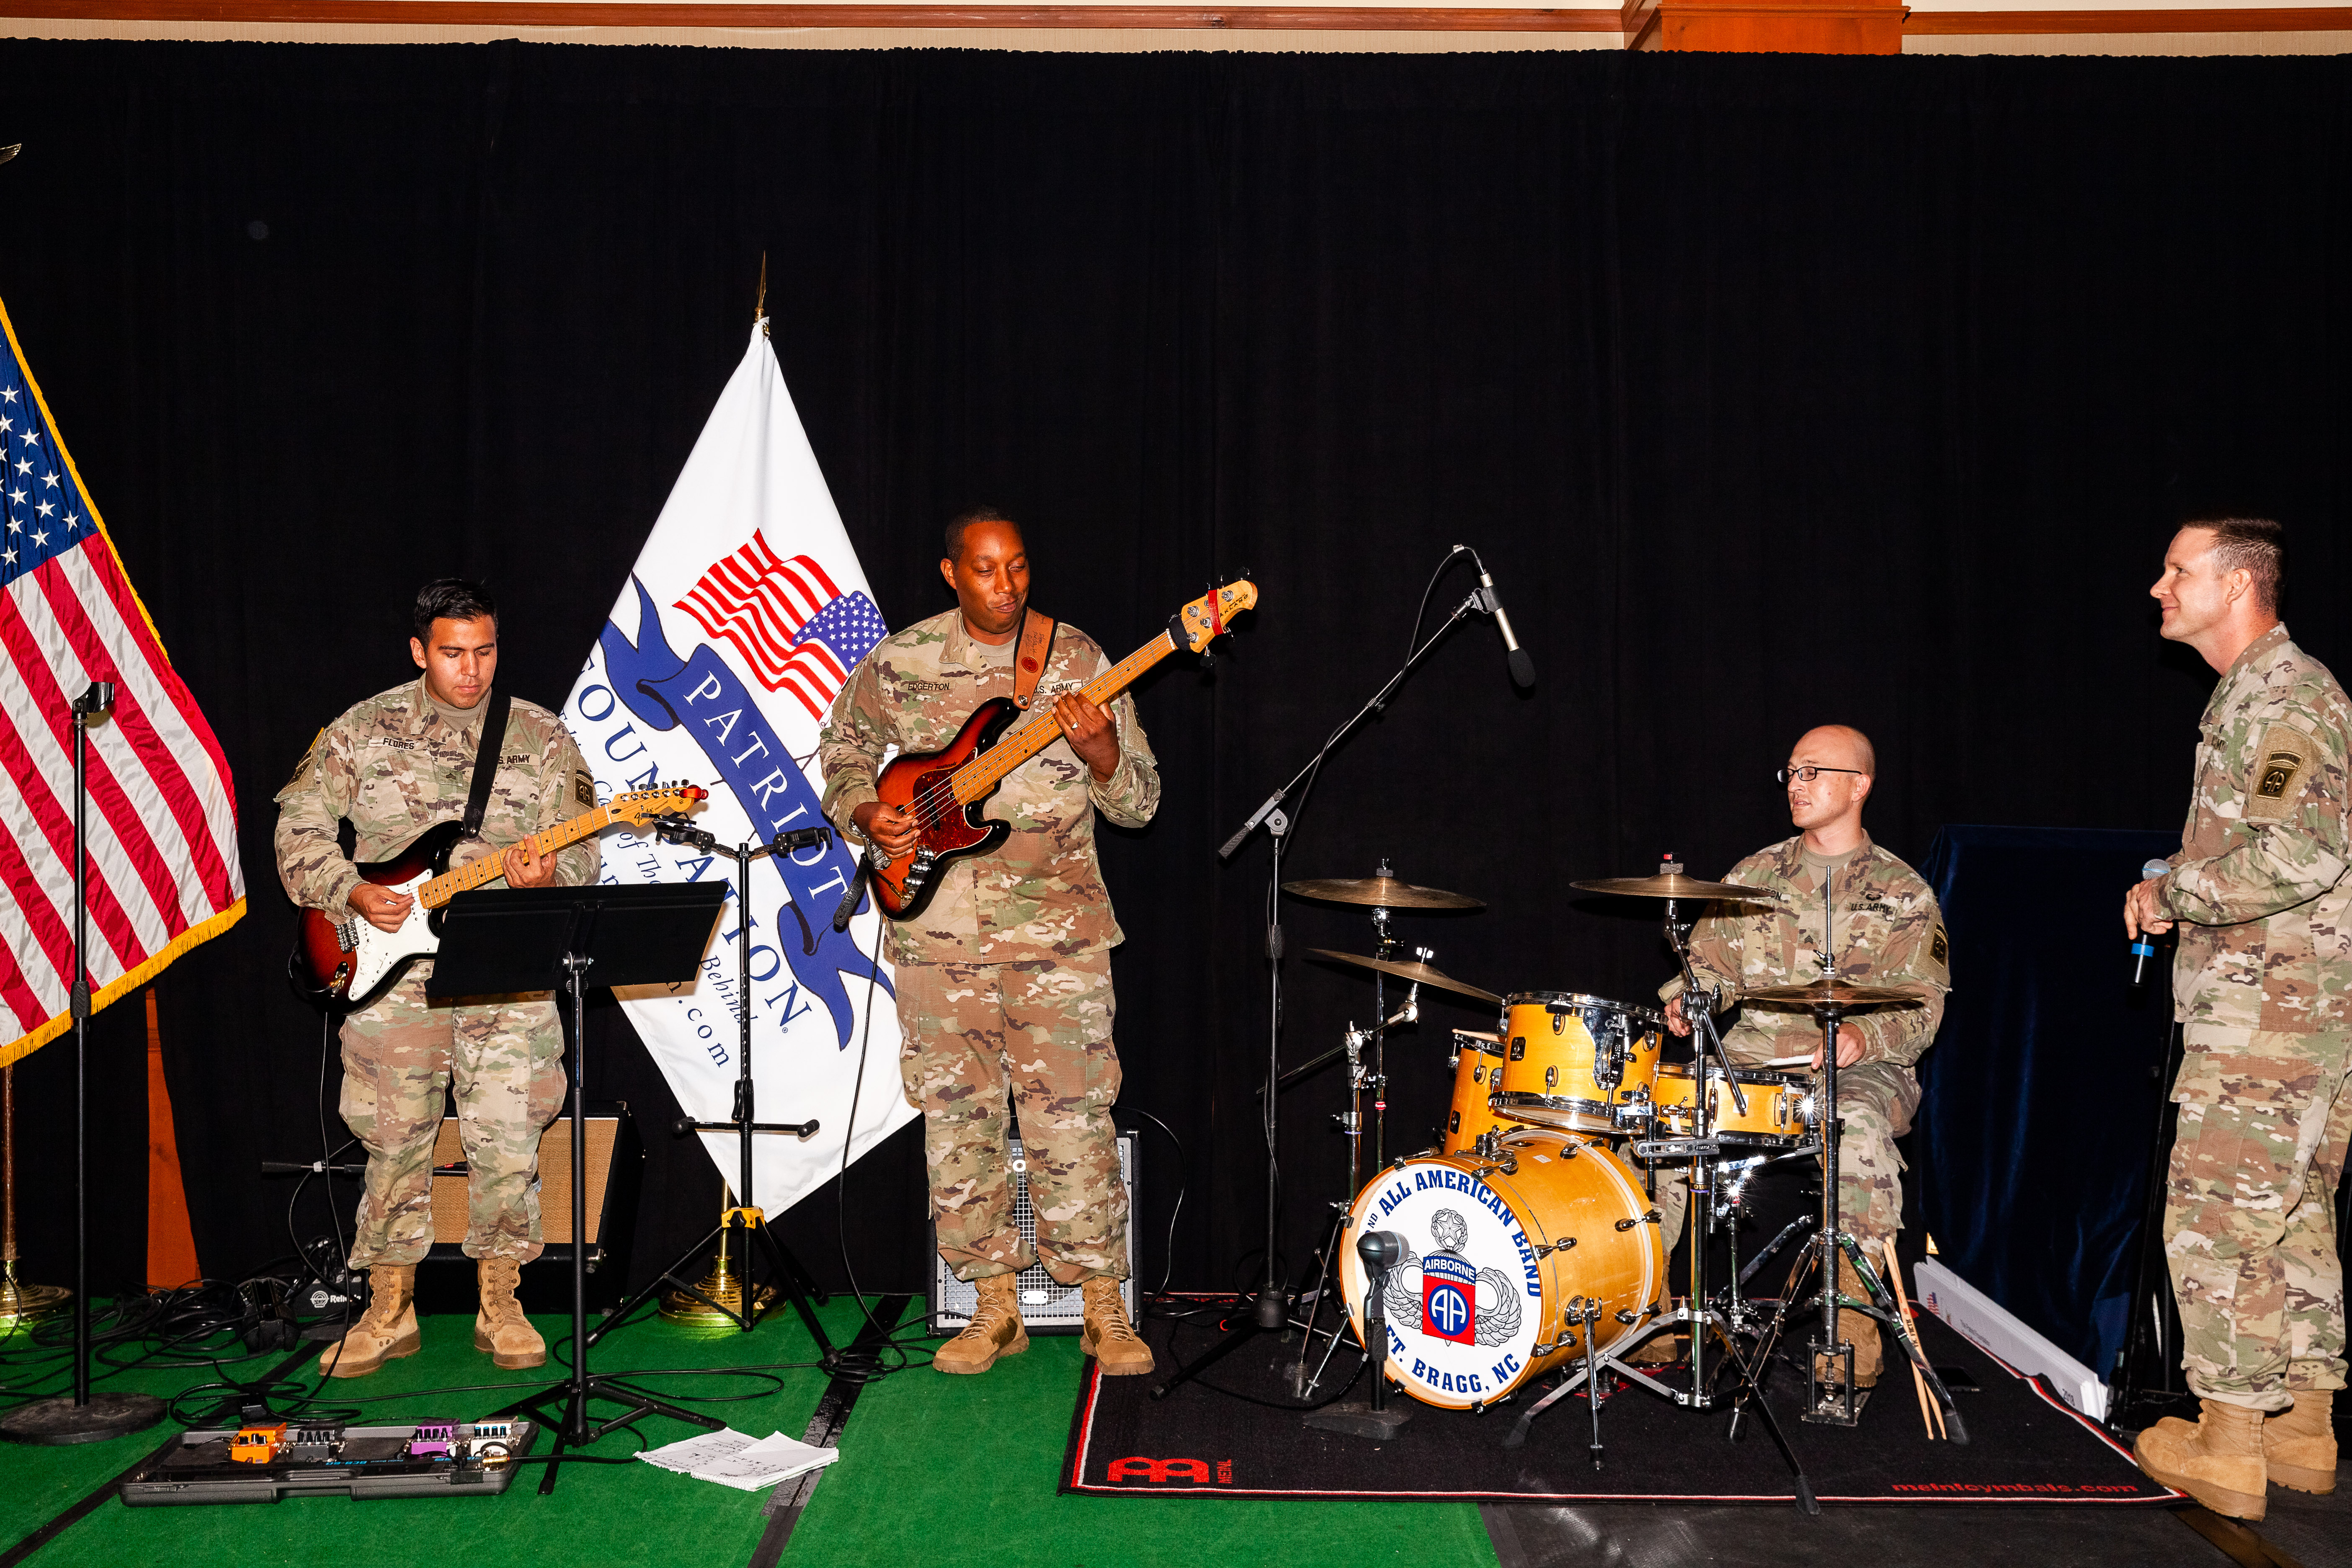 All American Jazz Ensemble